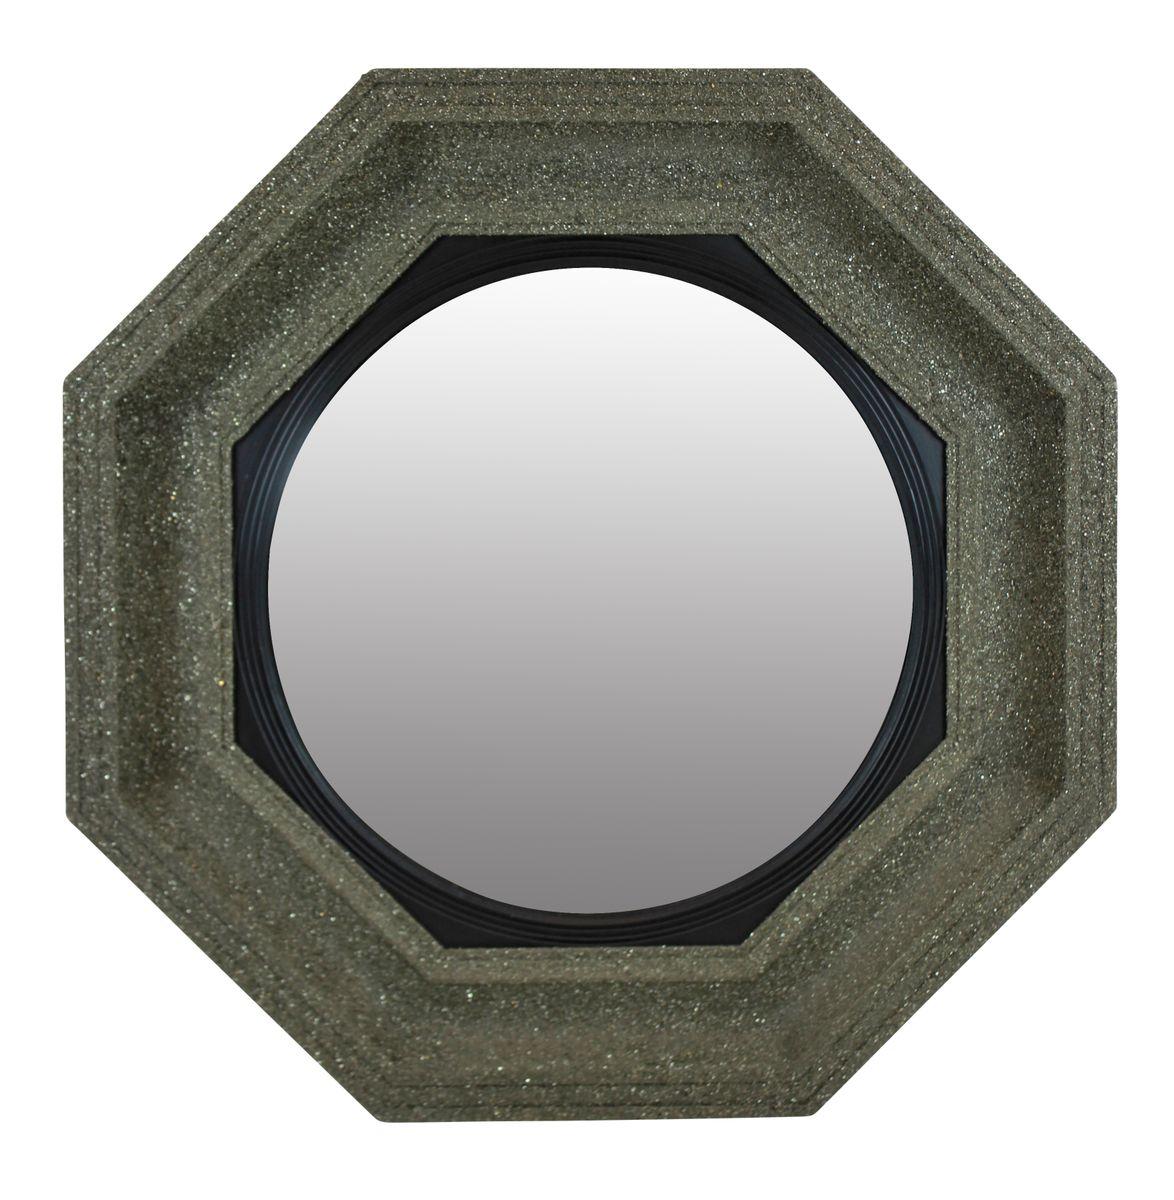 Grand miroir convex mid century avec cadre en min raux for Grand miroir en solde